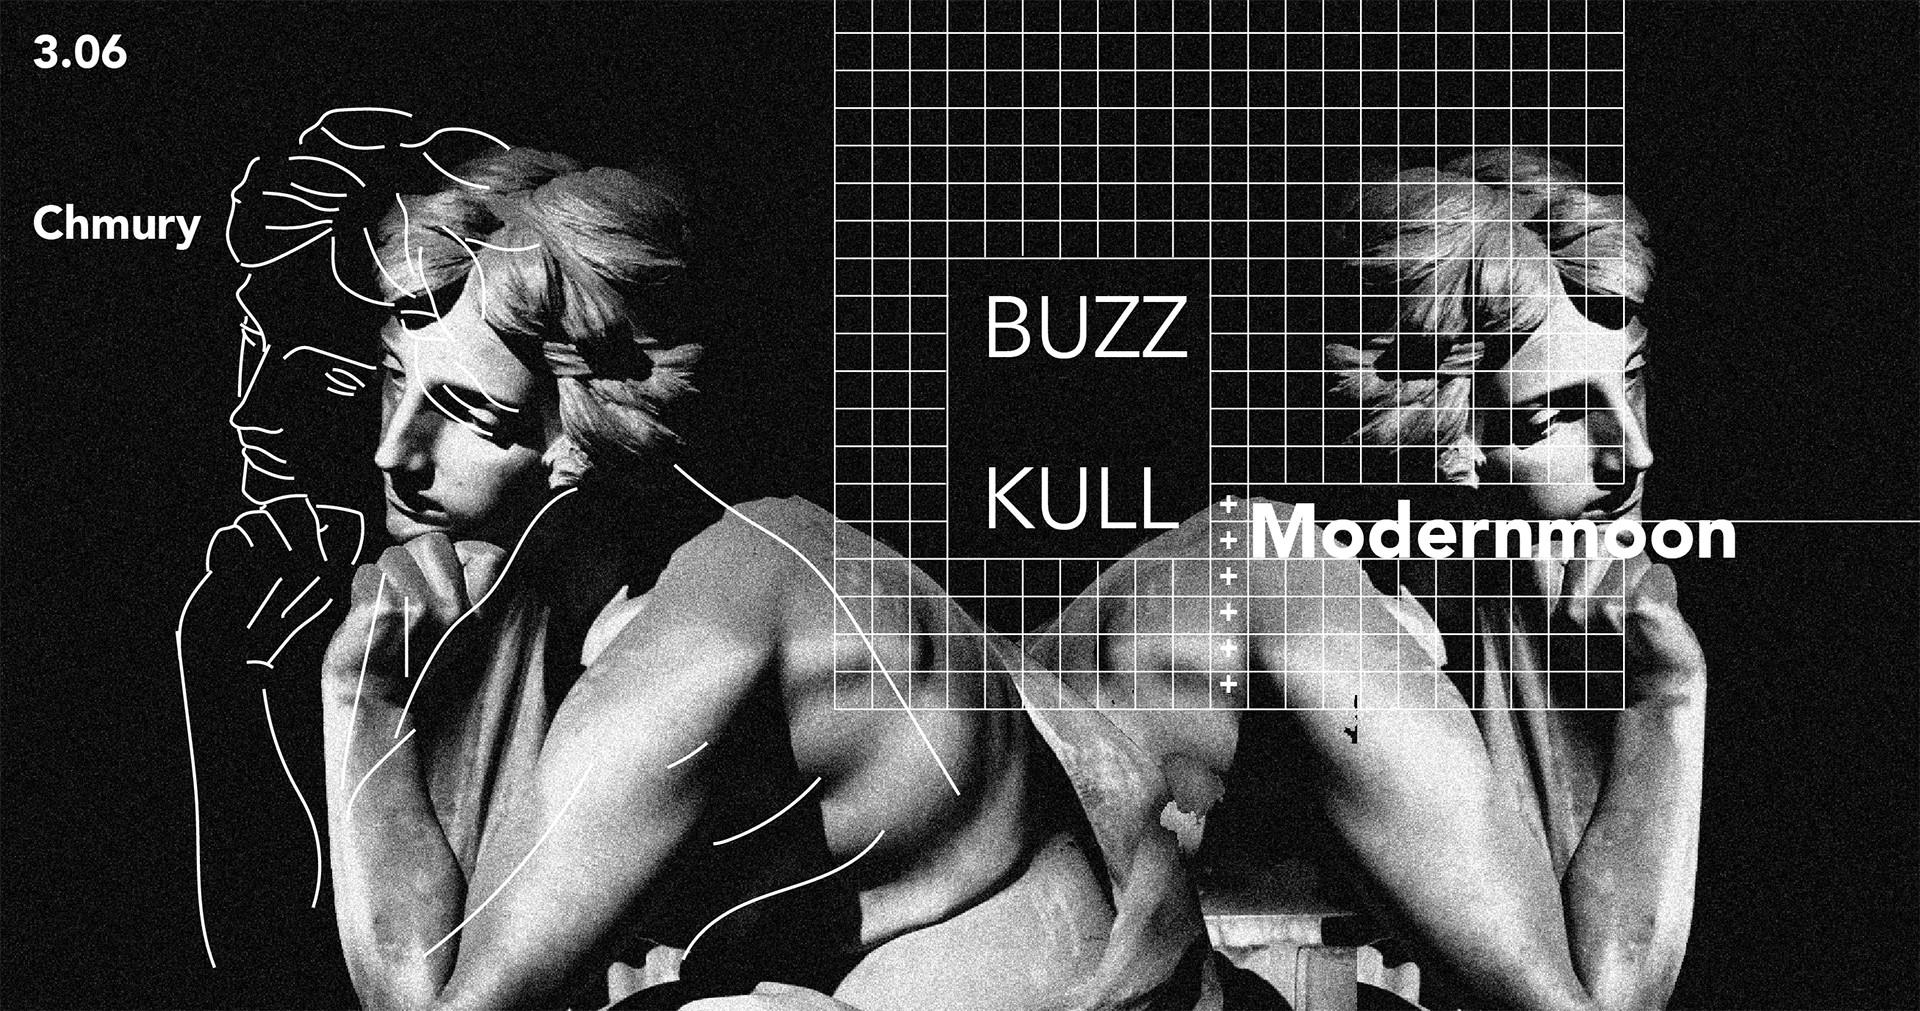 Buzz Kull i Modernmoon - Chmury - Warszawa - 03.06.2018